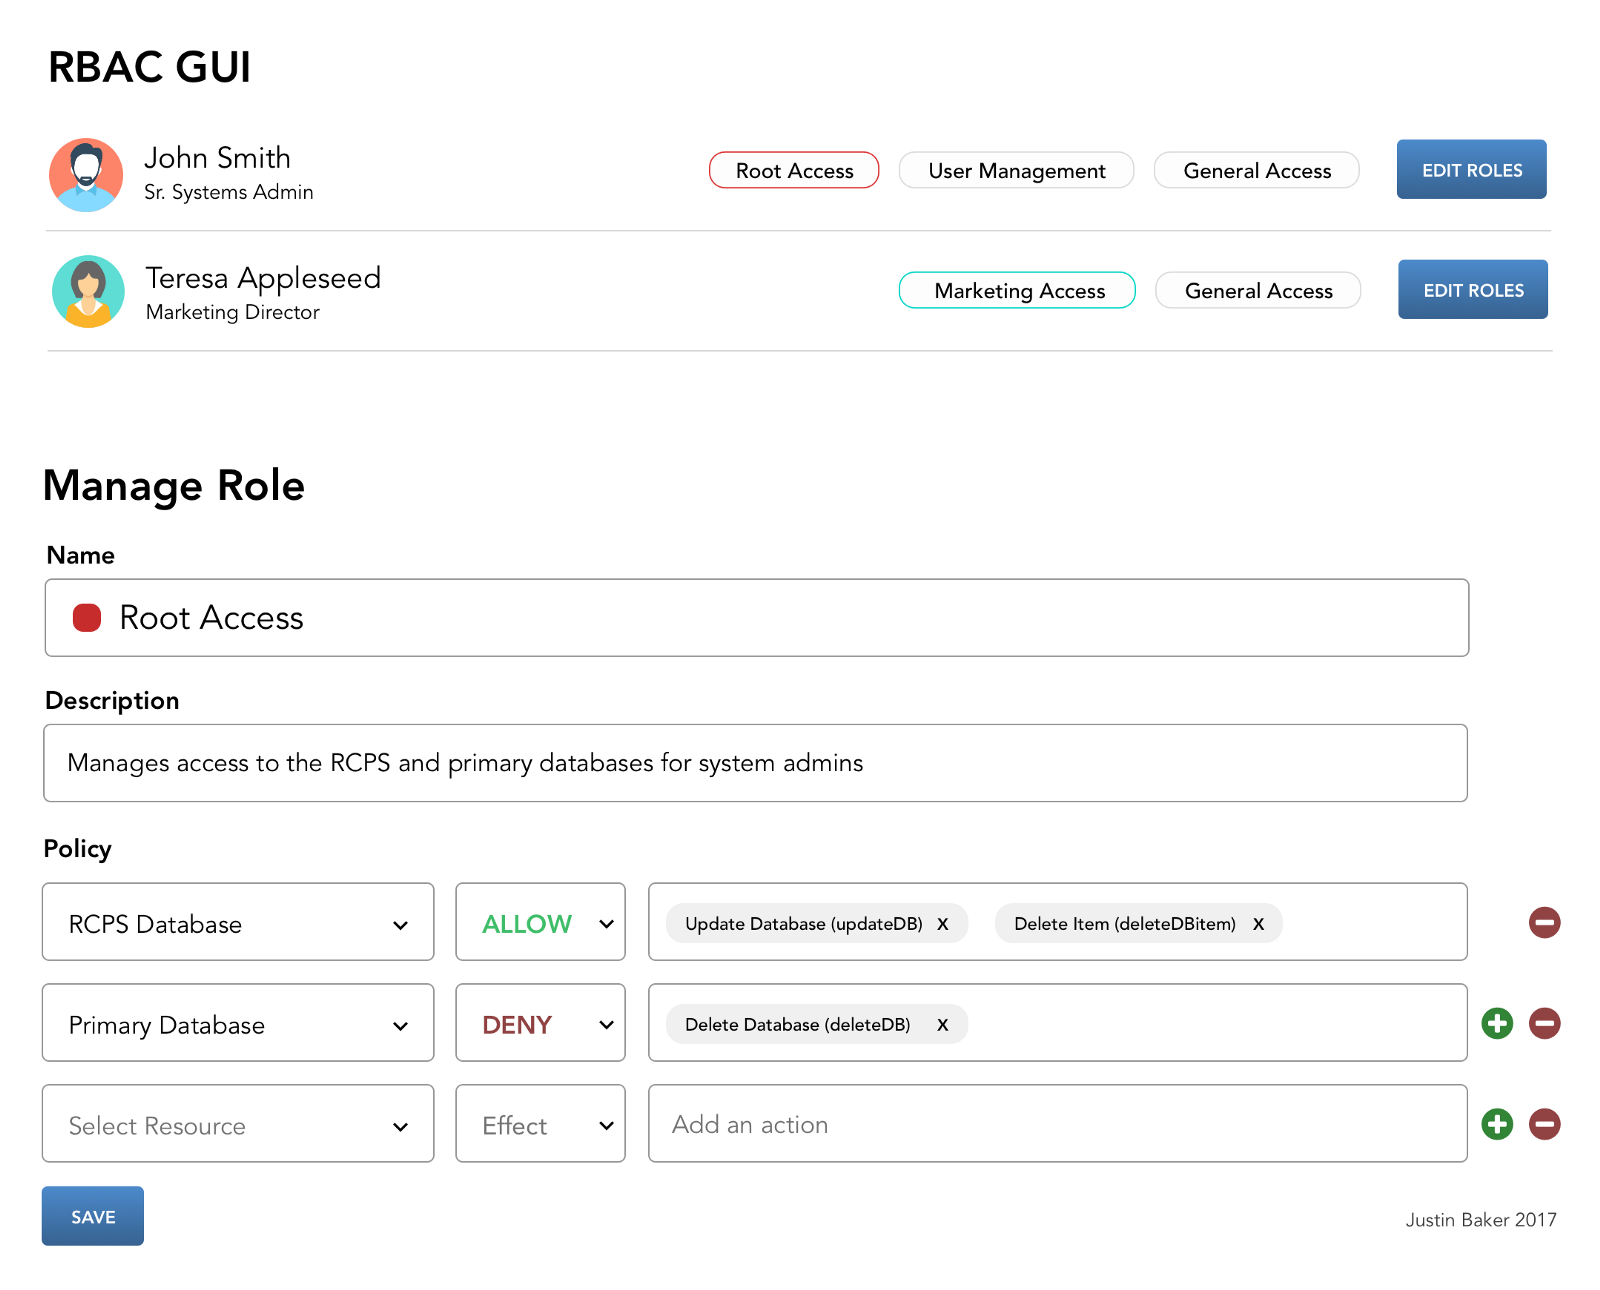 /designing-an-enterprise-role-based-access-control-rbac-system-96e645c659b7 feature image